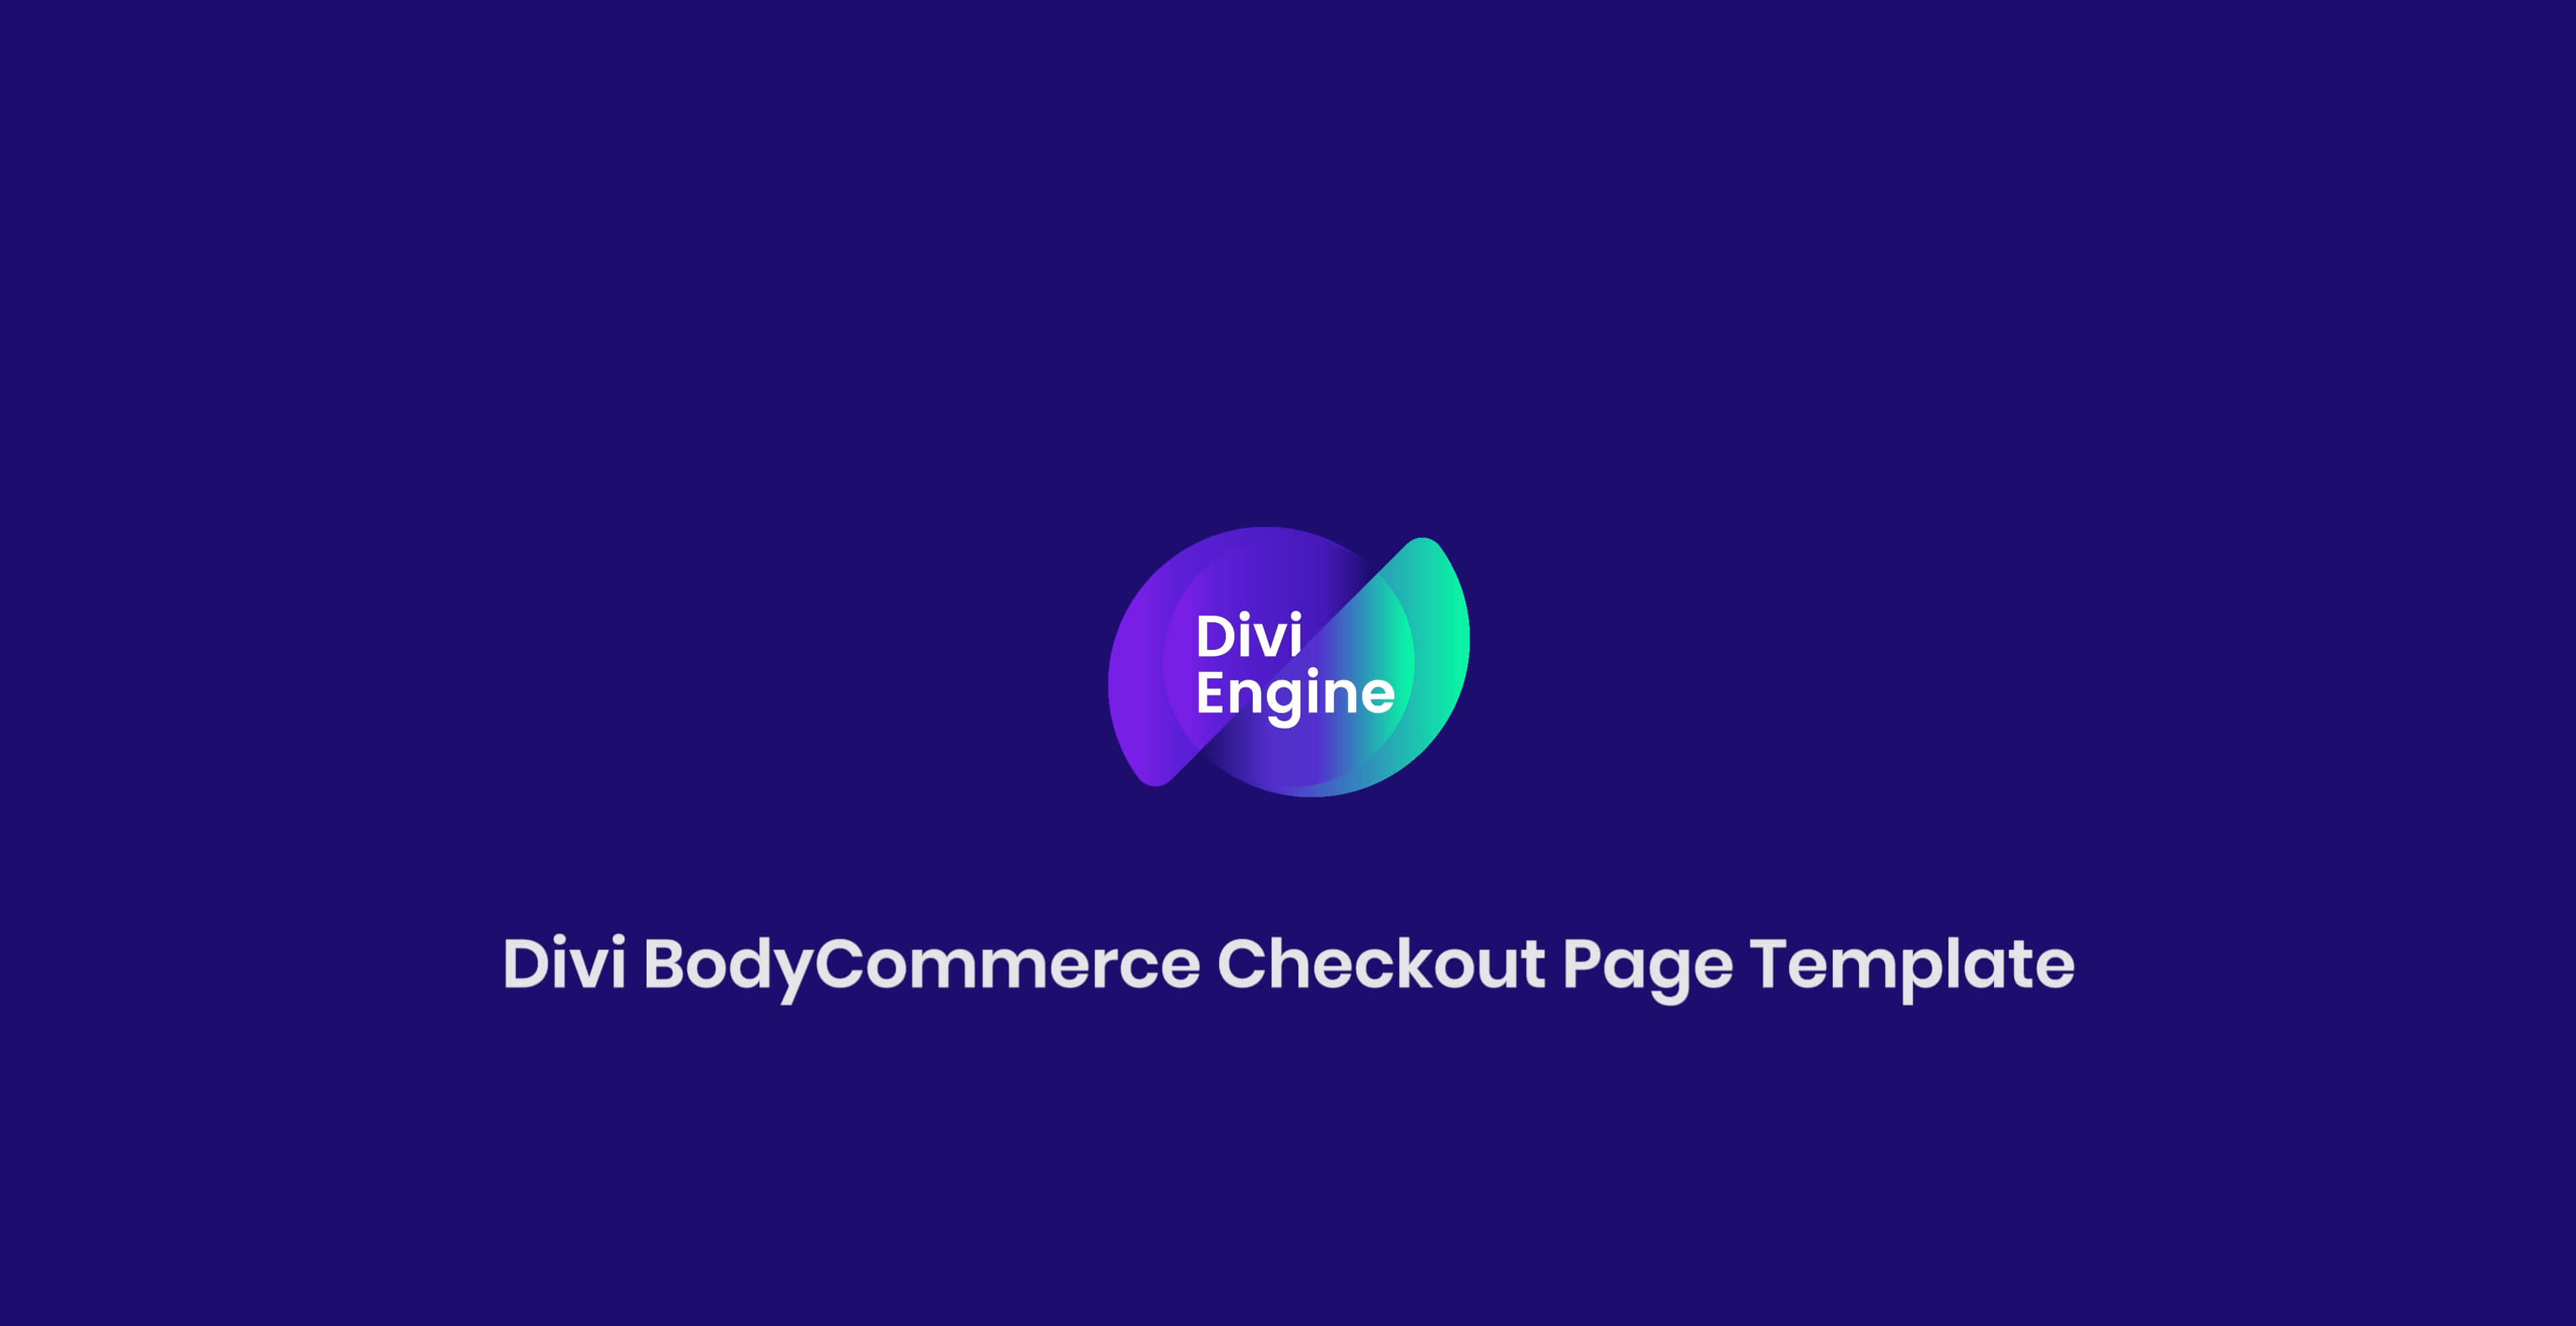 Divi BodyCommerce